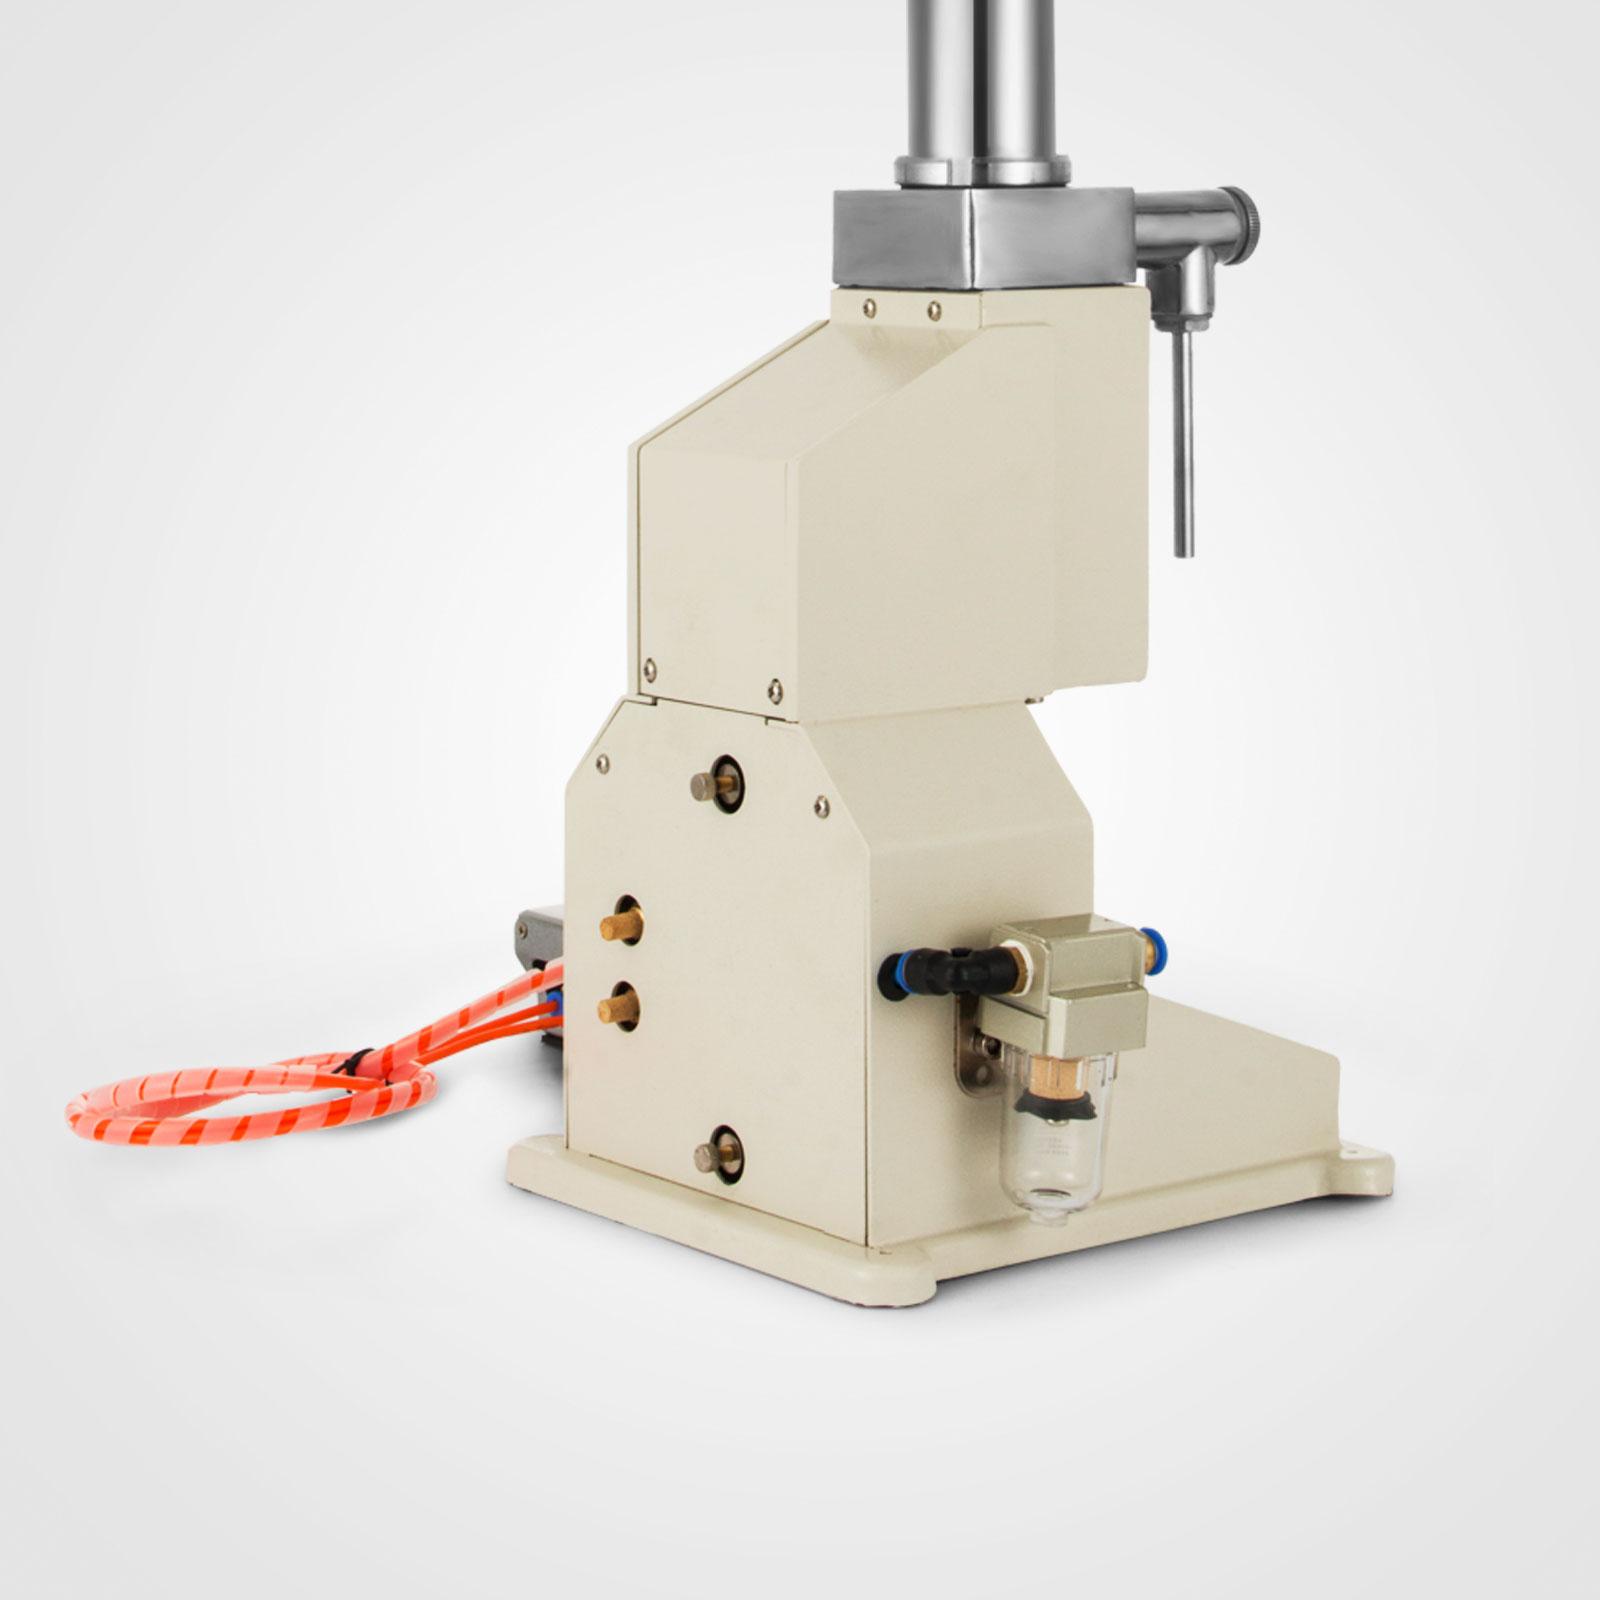 Liquid-Filling-Machine-Filler-Remplissage-2-3500ML-50-500ML-INDUSTRY-SUPPLY miniature 60